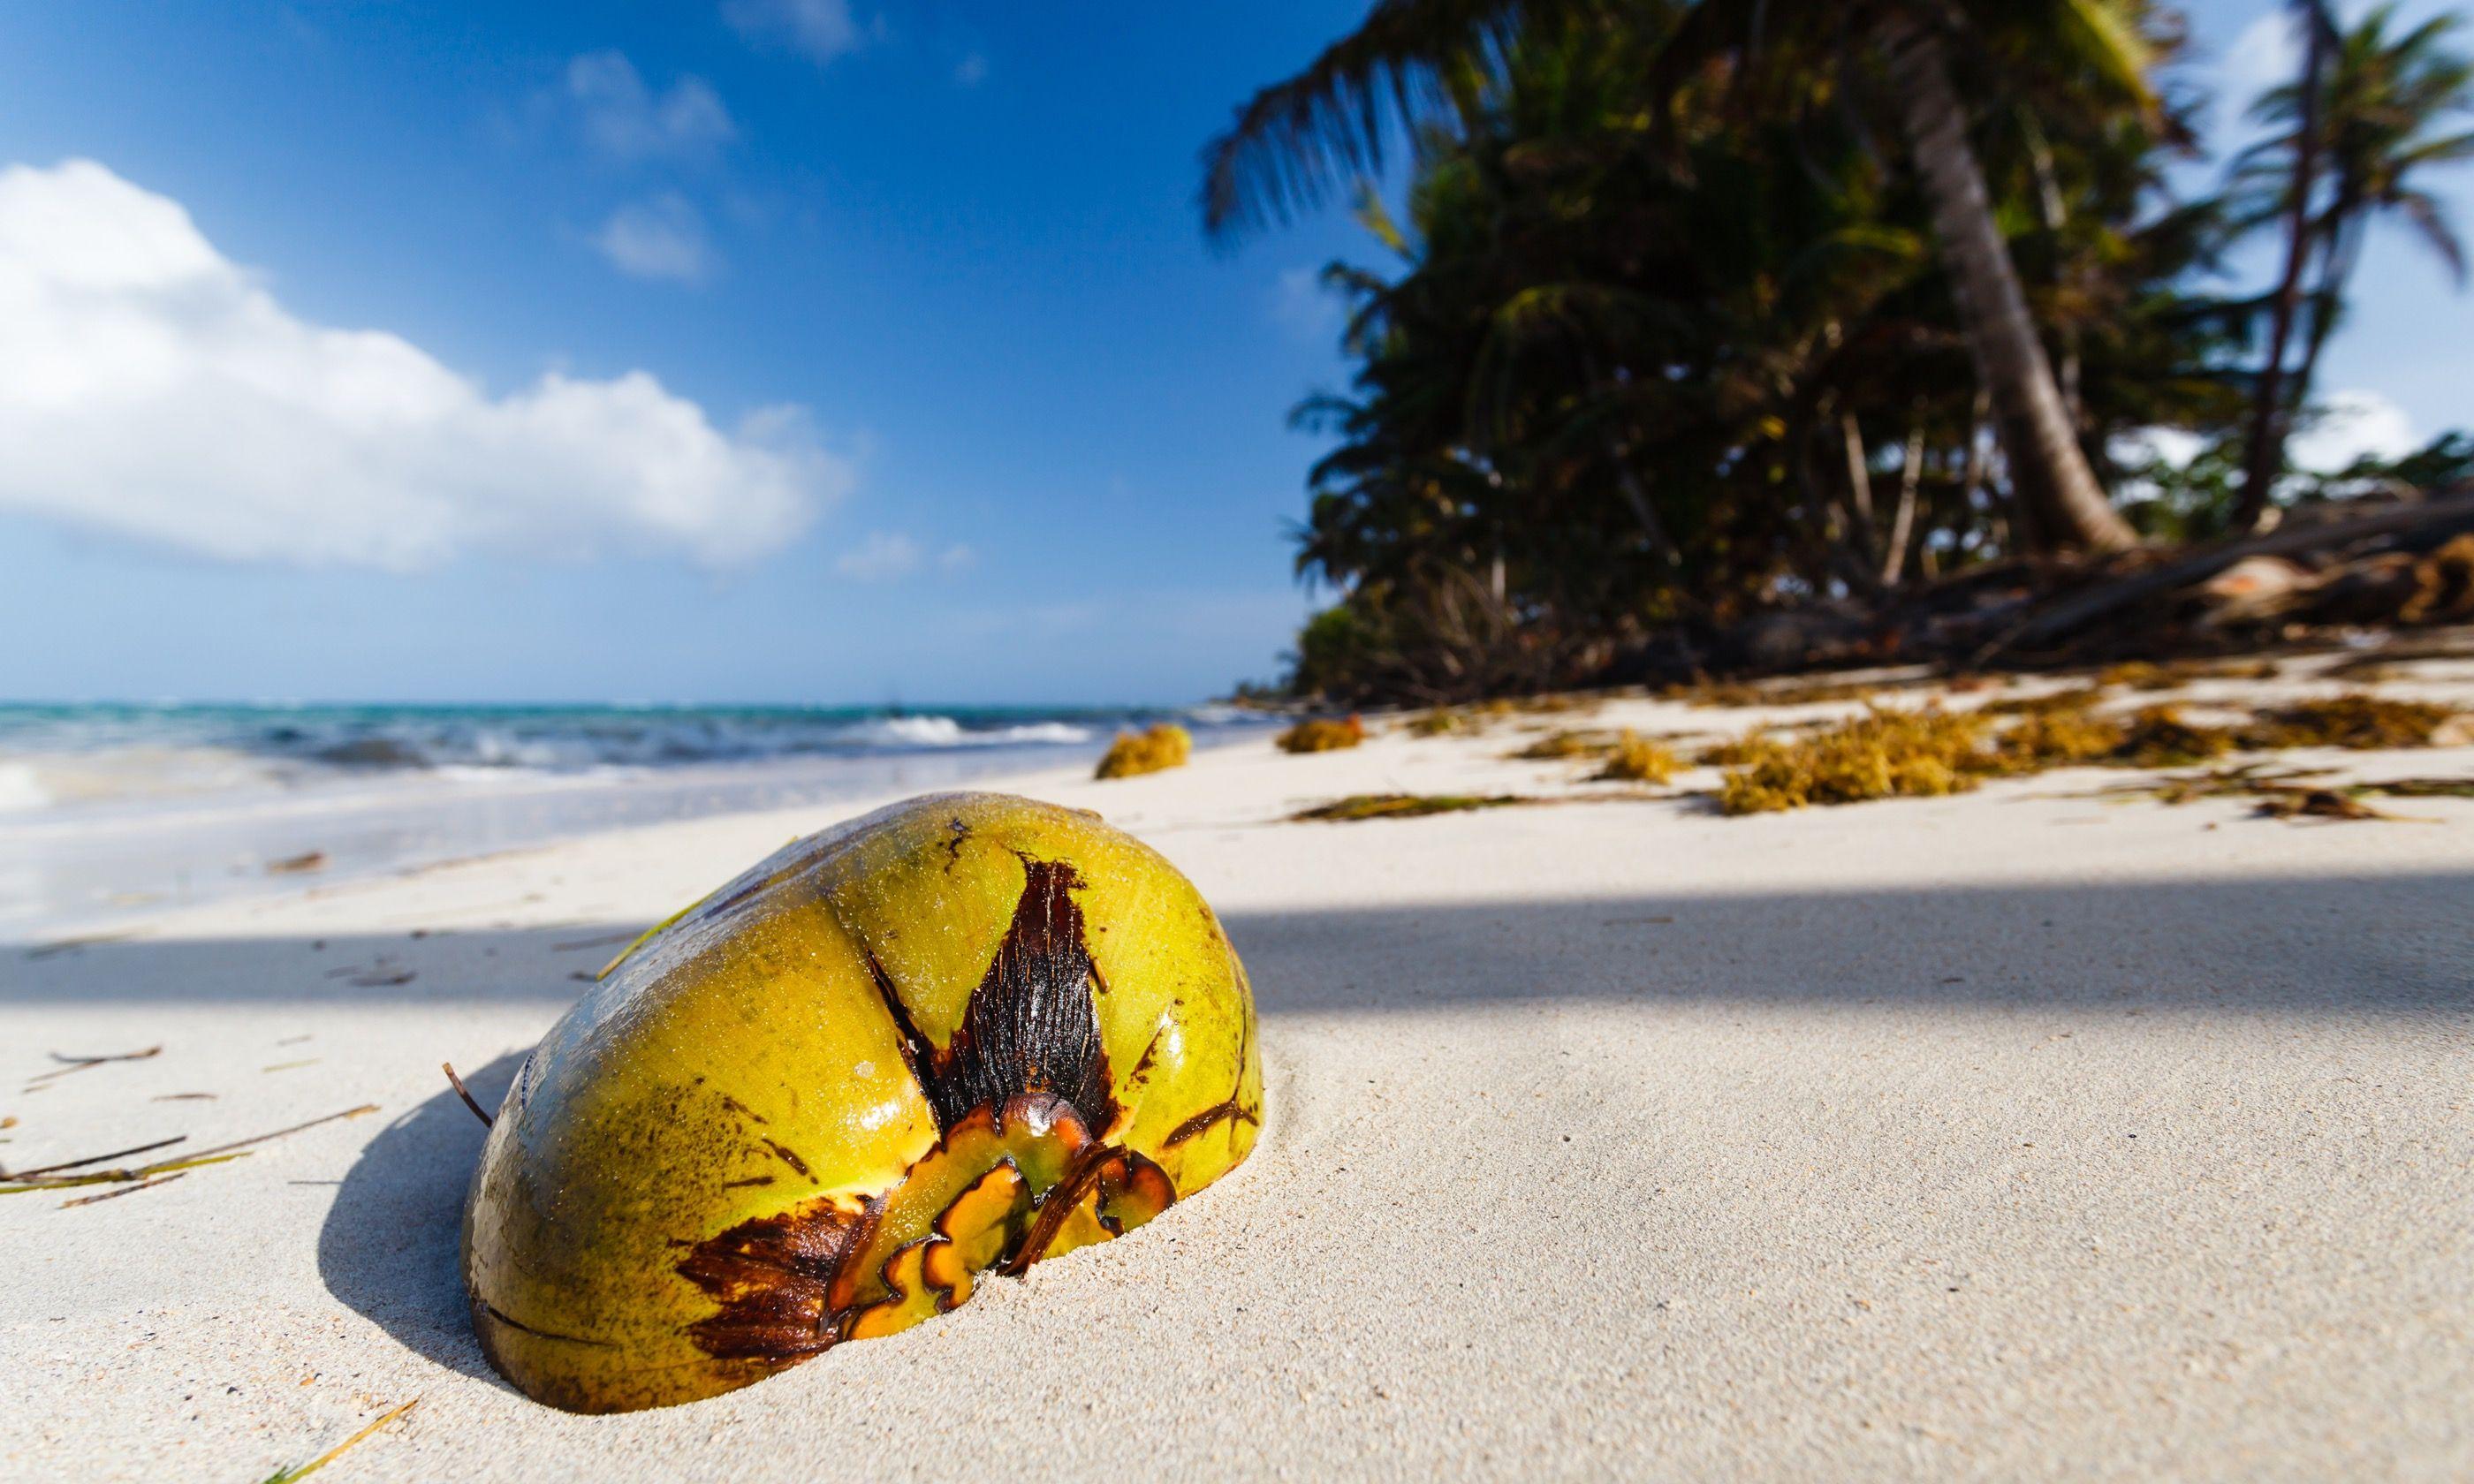 Beach on Little Corn Island, Nicaragua (Dreamstime)